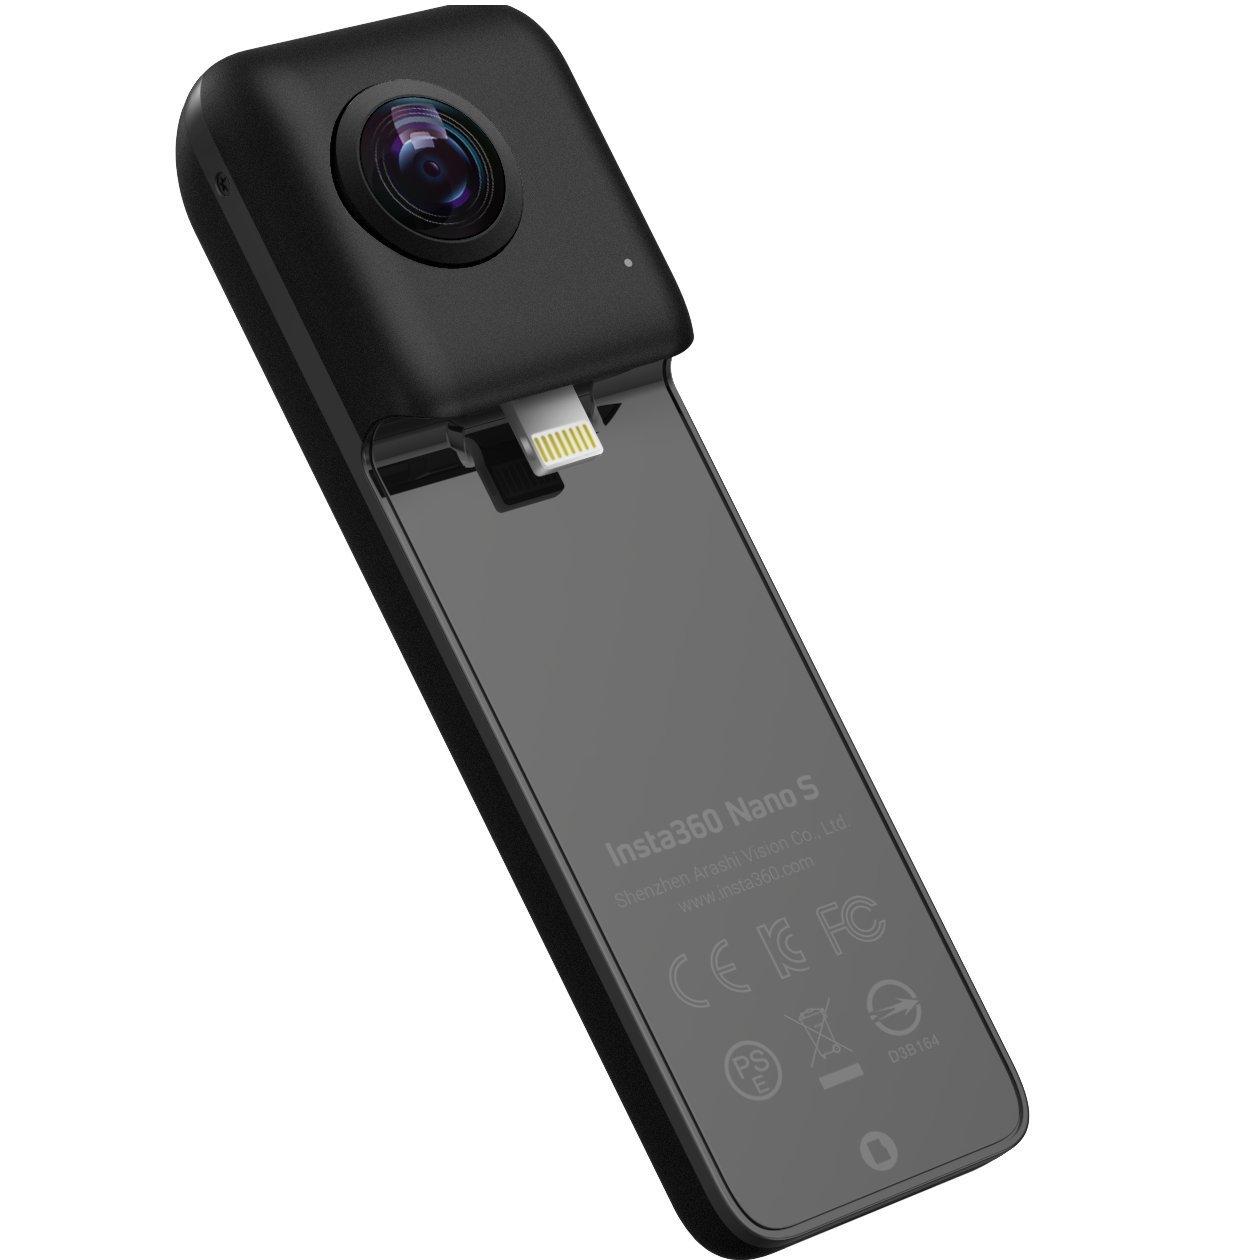 Insta360 Nano S 360 VRカメラ, 4K 超高解像度360度ビデオカメラ,デジカメ, 20MP写真, 対応機種iPhone X, iPhone 8 シリーズ, iPhone 7 シリーズ, iPhone 6 シリーズ, iOS 9.0以上